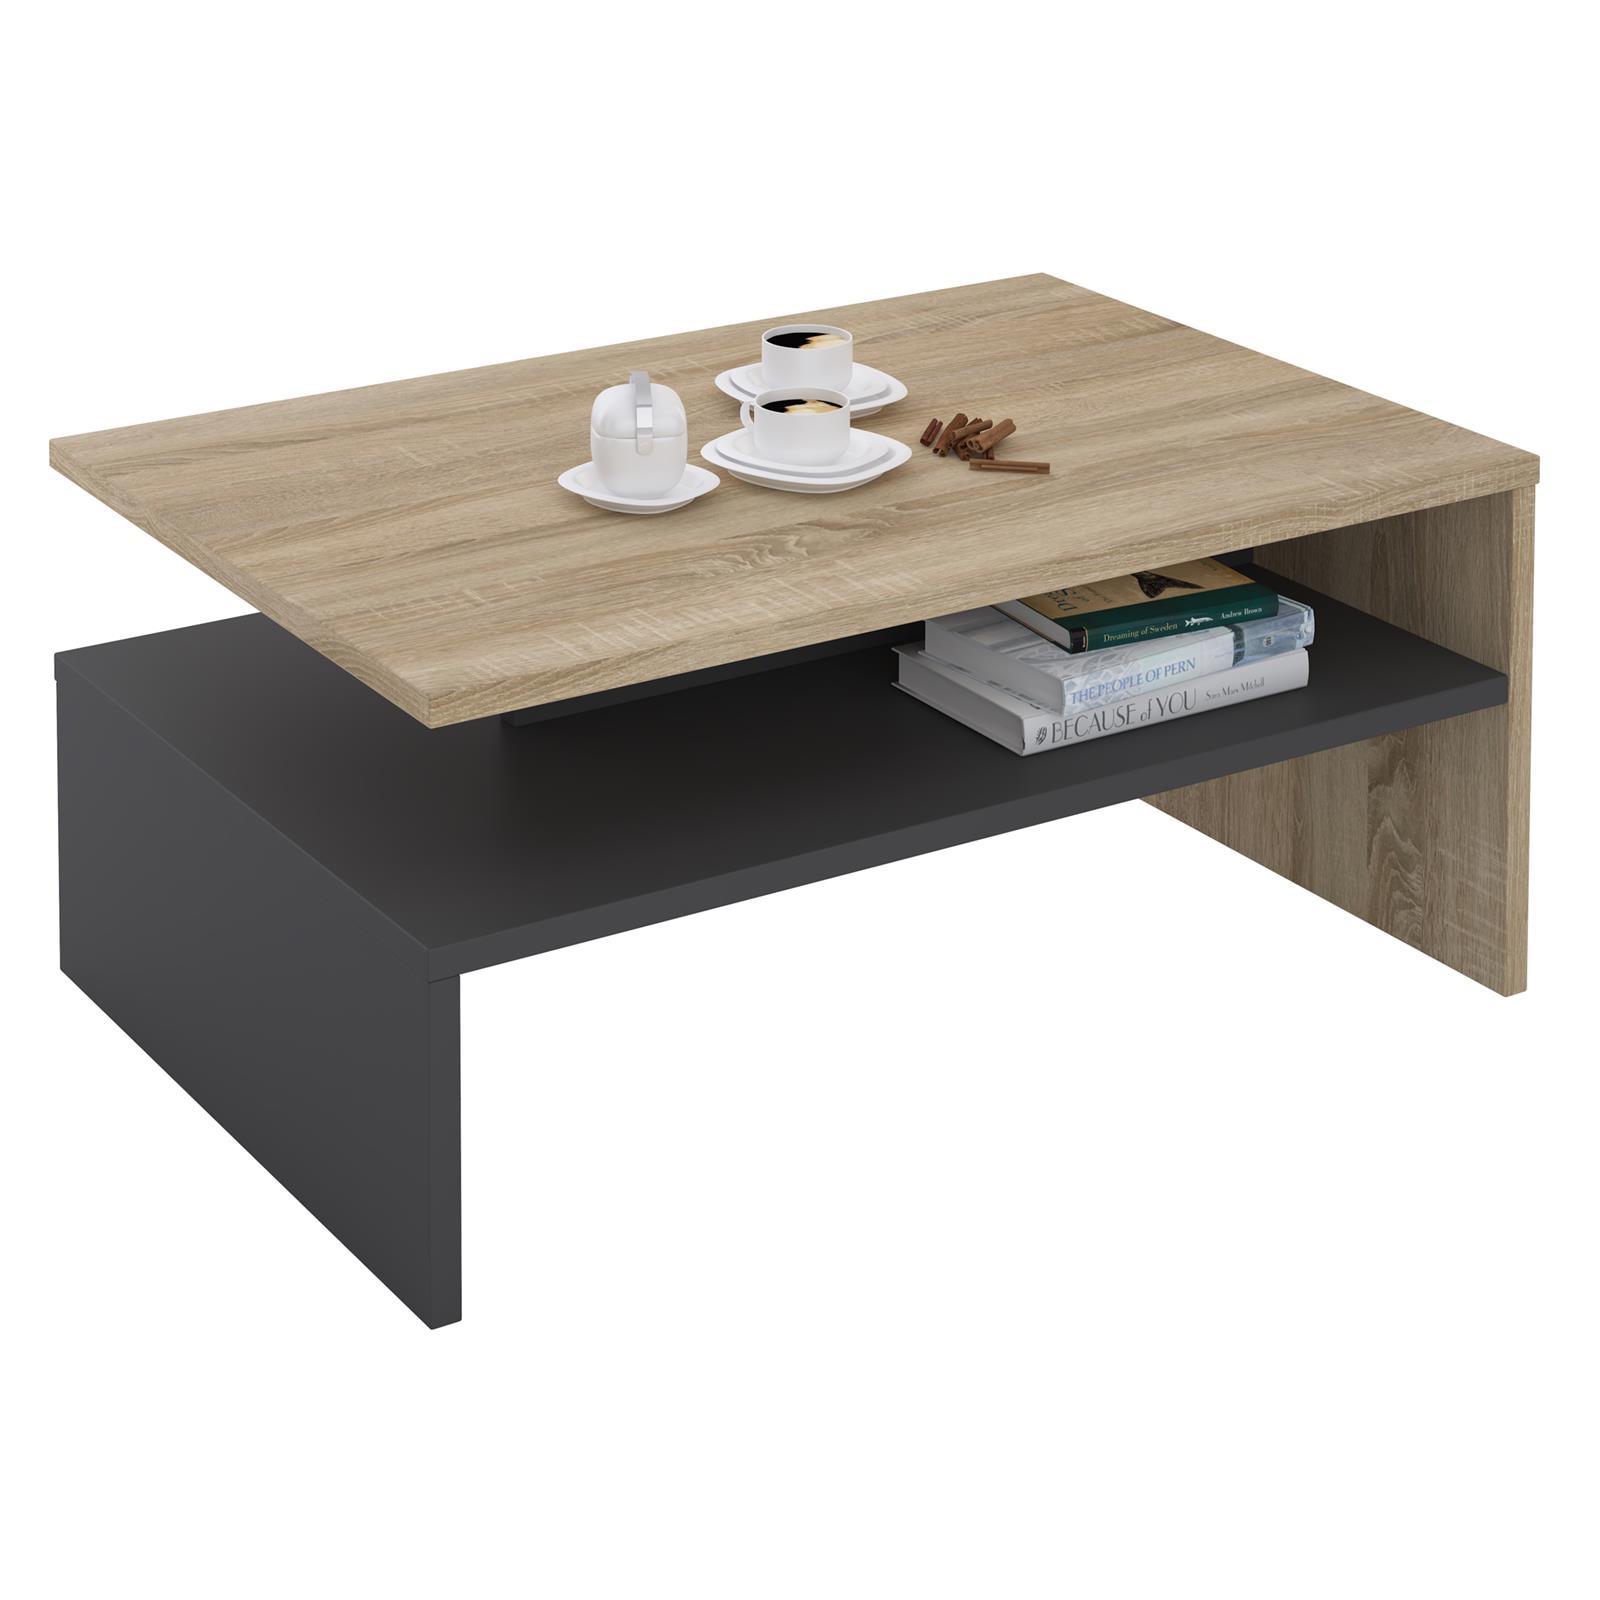 table basse adelaide m lamin ch ne sonoma et gris mat mobil meubles. Black Bedroom Furniture Sets. Home Design Ideas